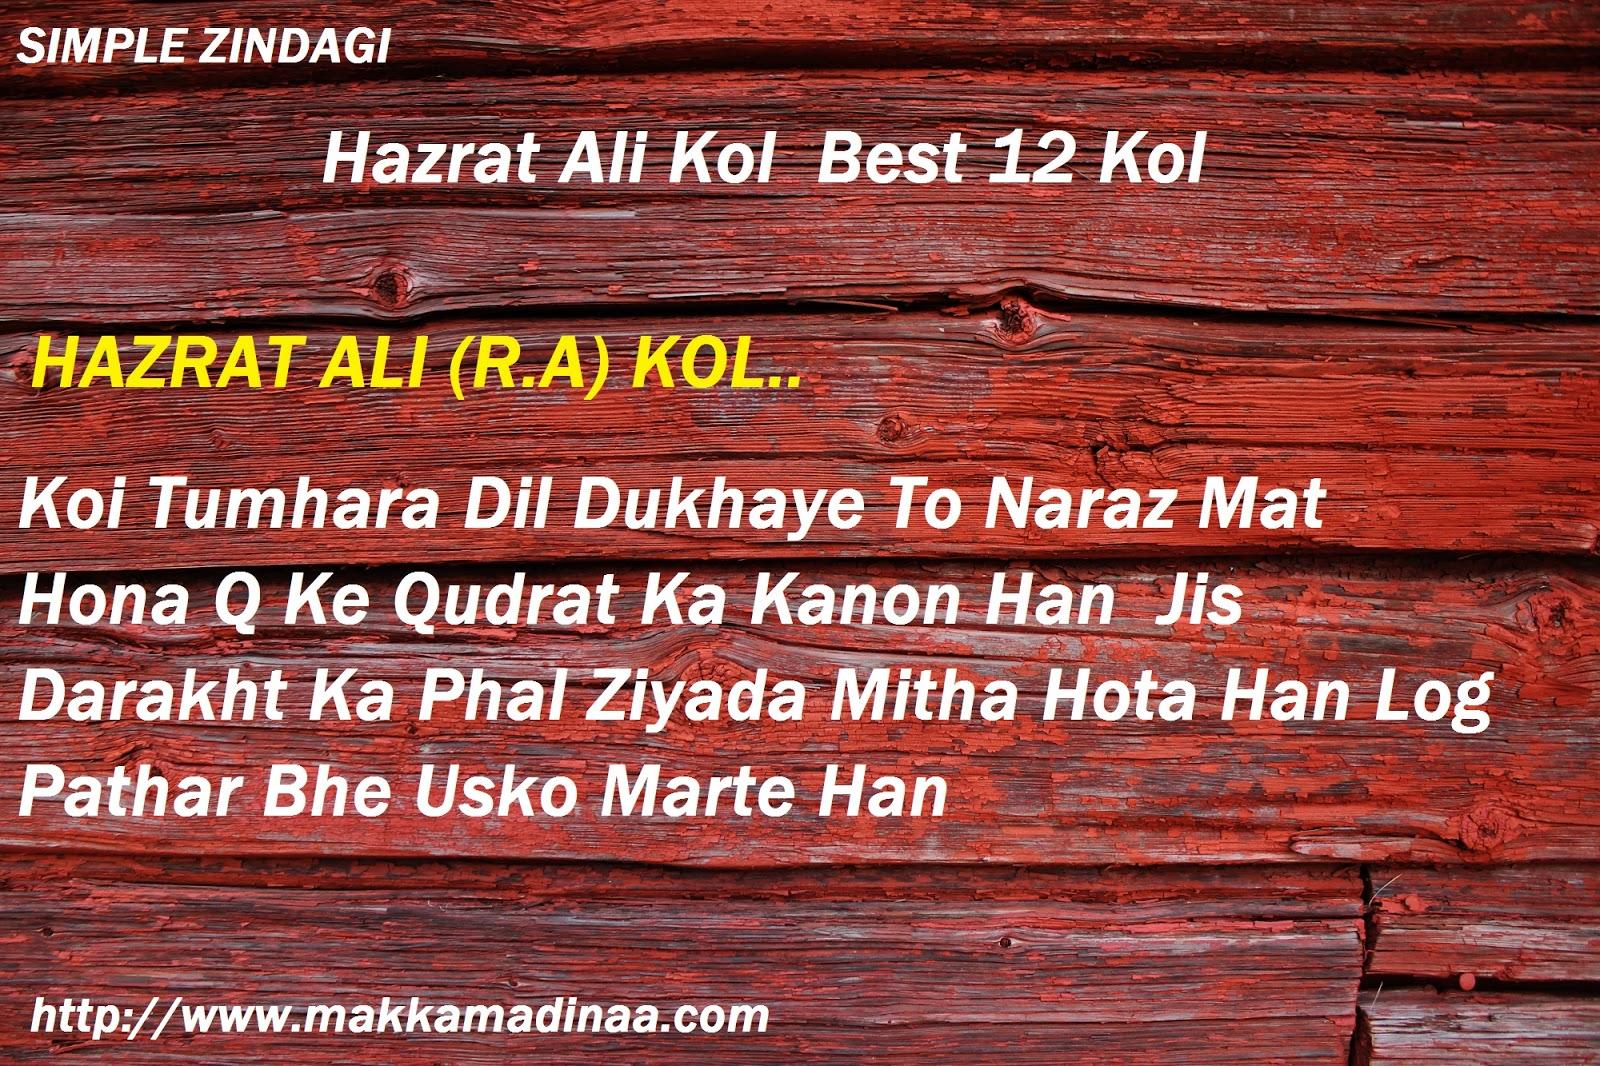 Hazrat Ali Kol  Best 12 Kol